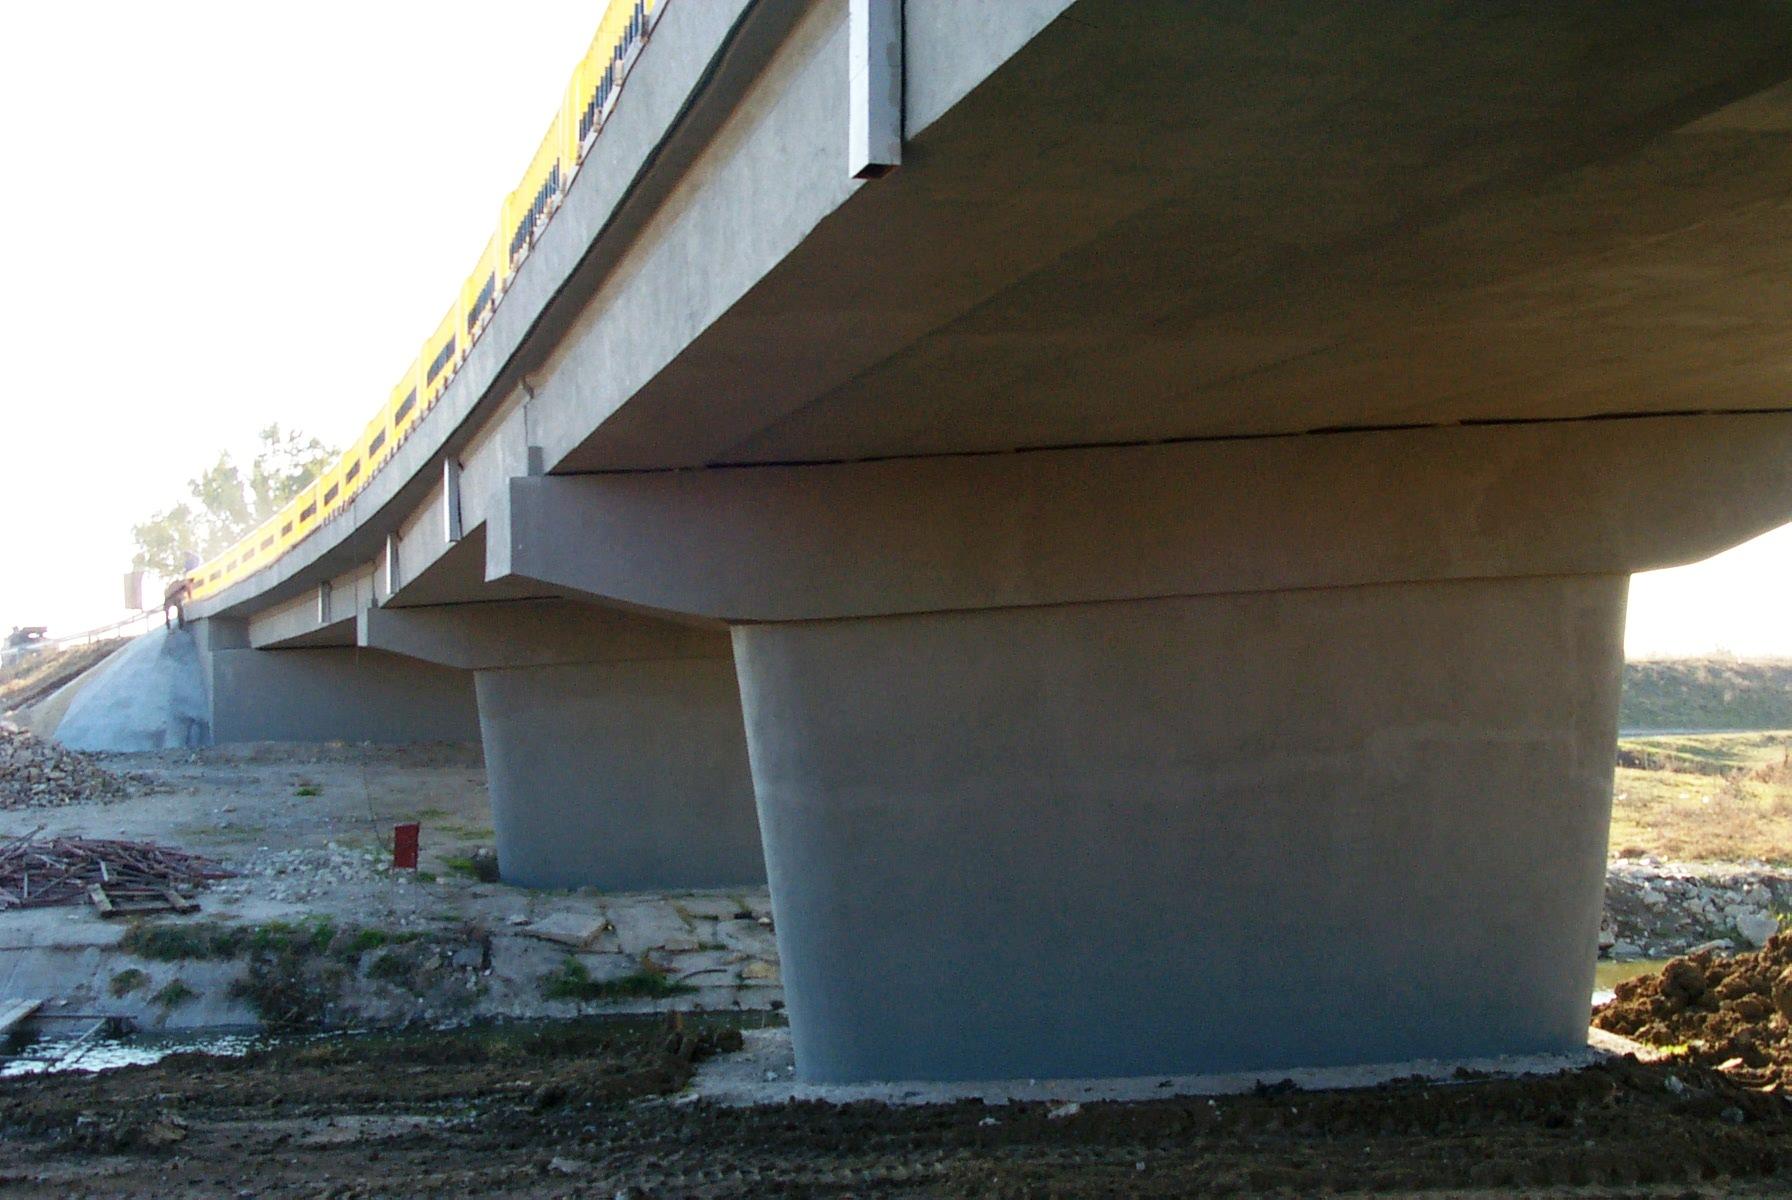 Reparatii pod (DN2), Km. 33 - 028, peste raul Calnistea MAPEI - Poza 126